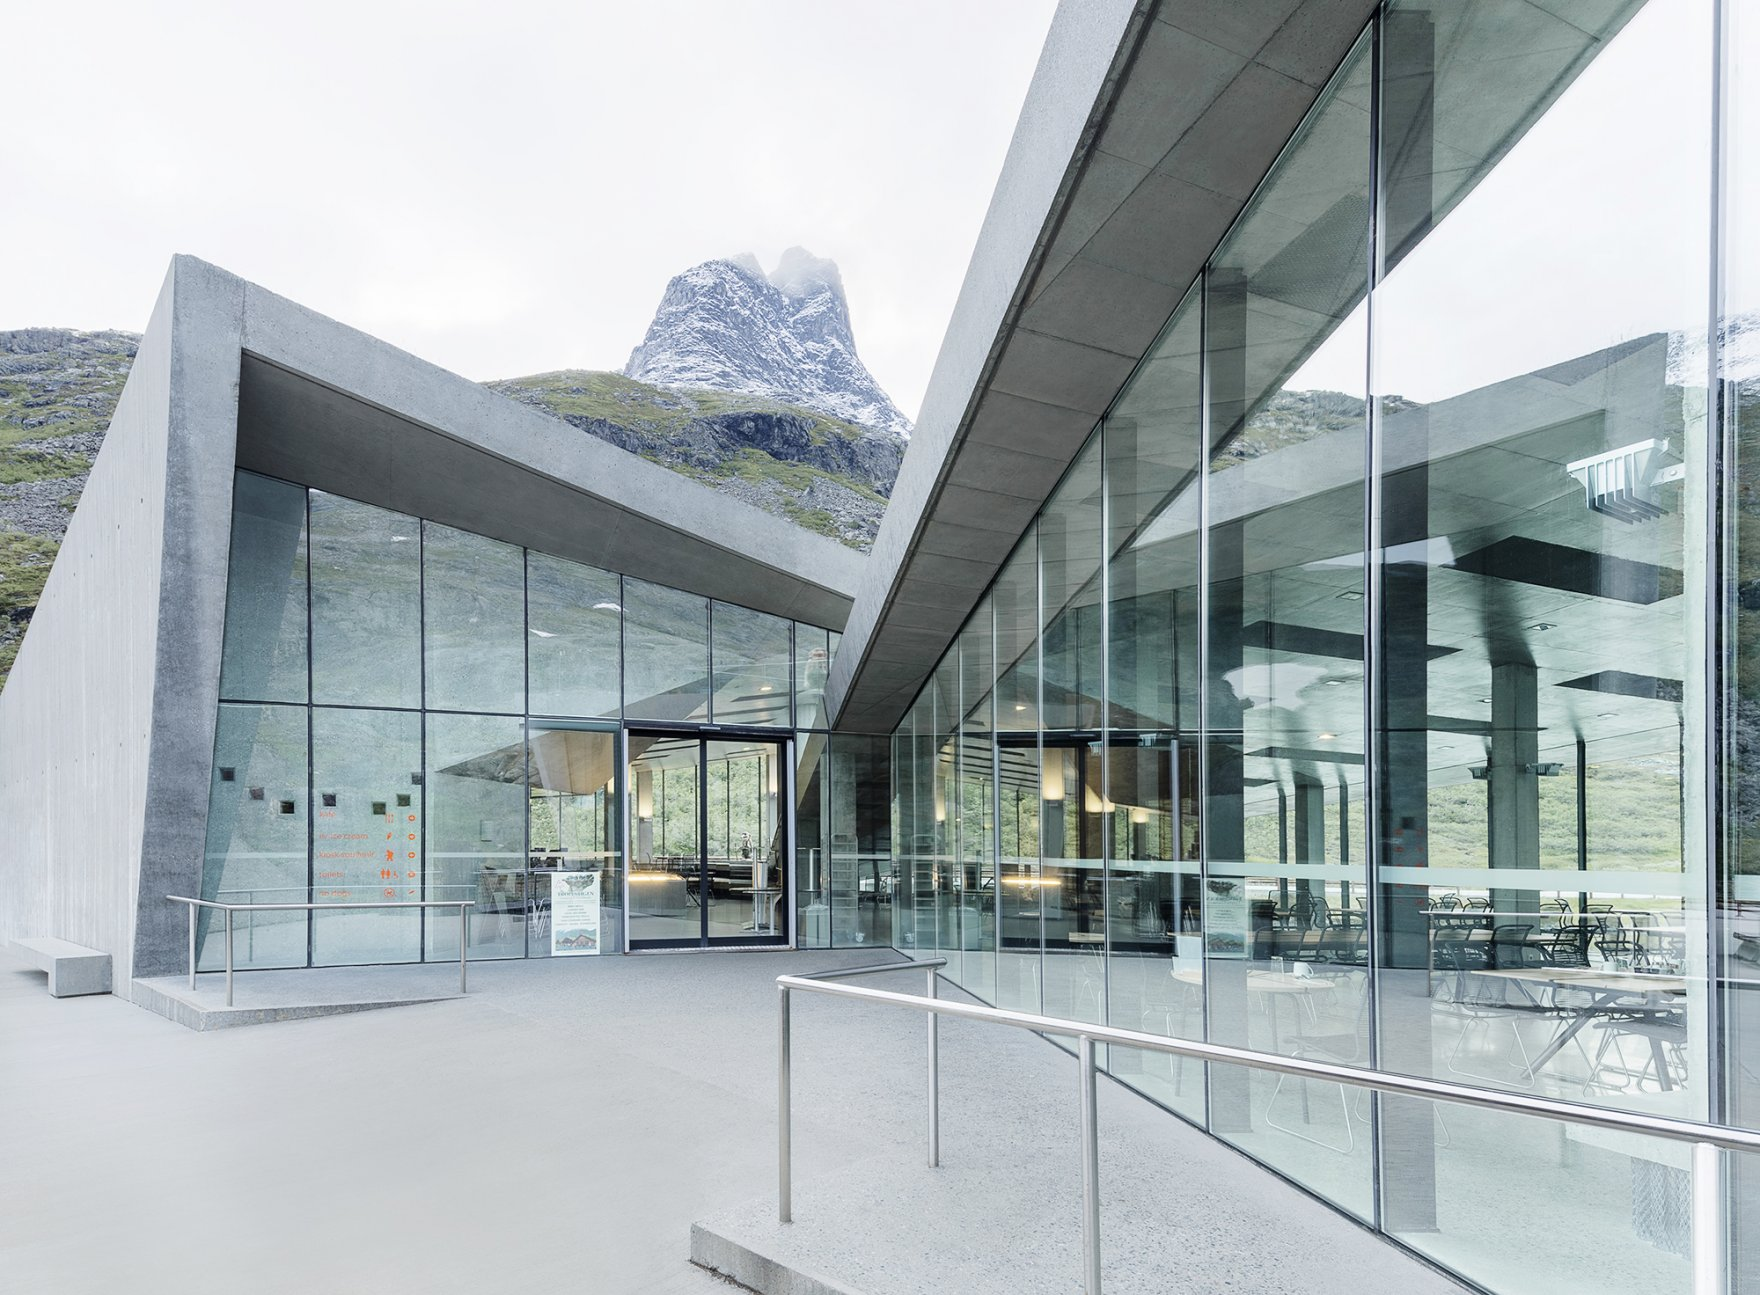 Trollstigen Visitor Centre & Viewpoint